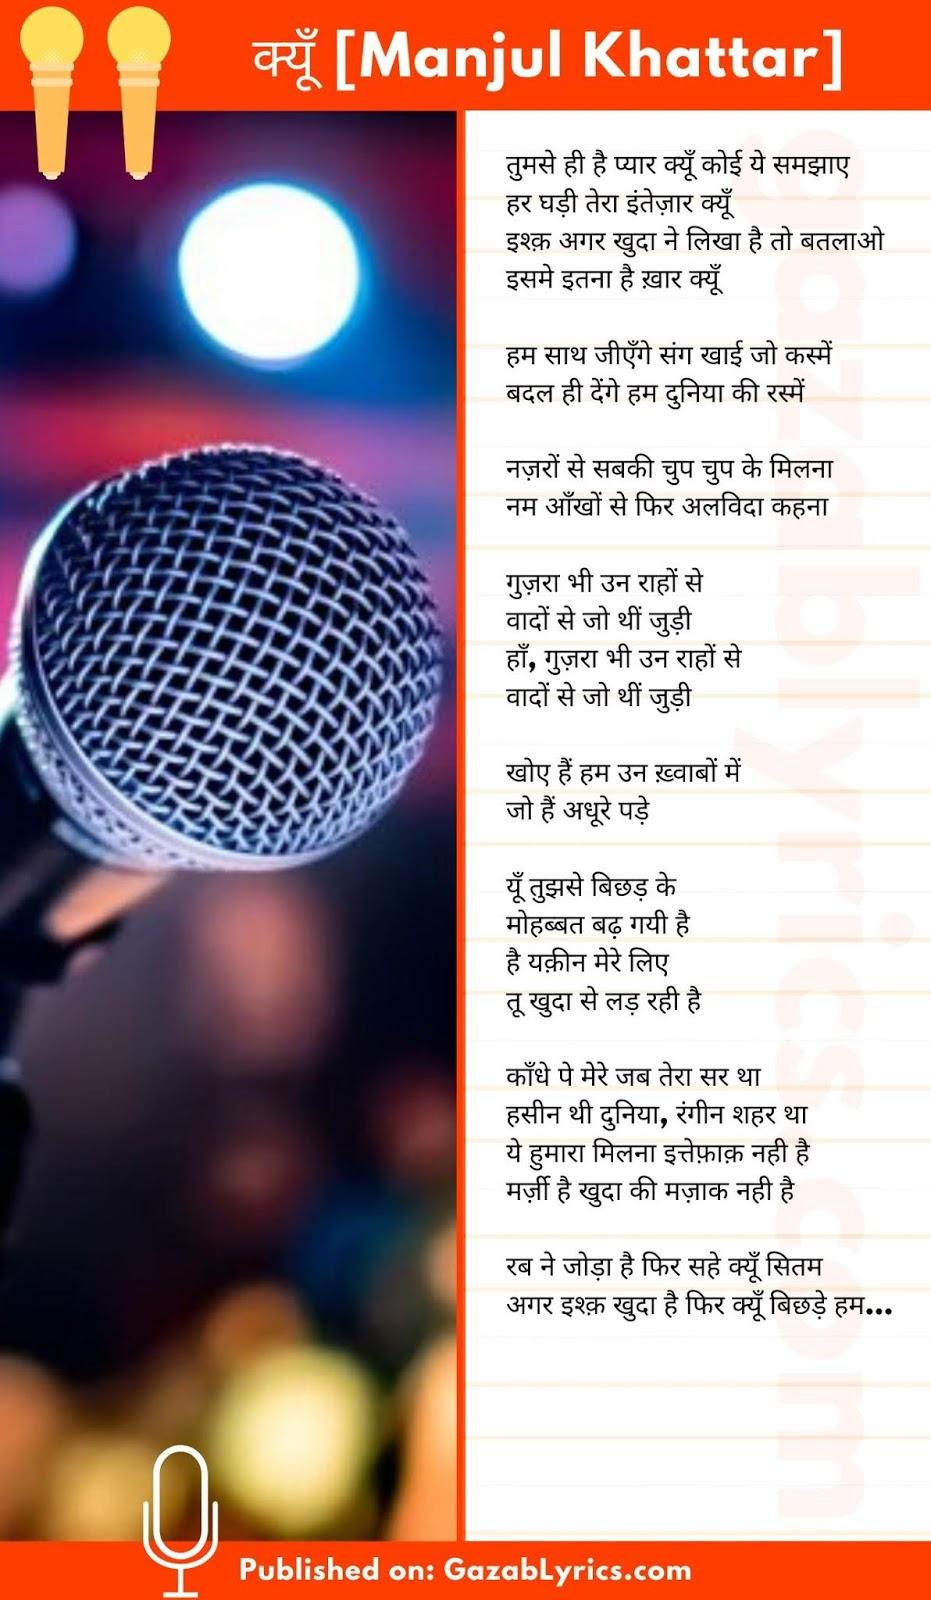 Kyun song lyrics image manjul khattar